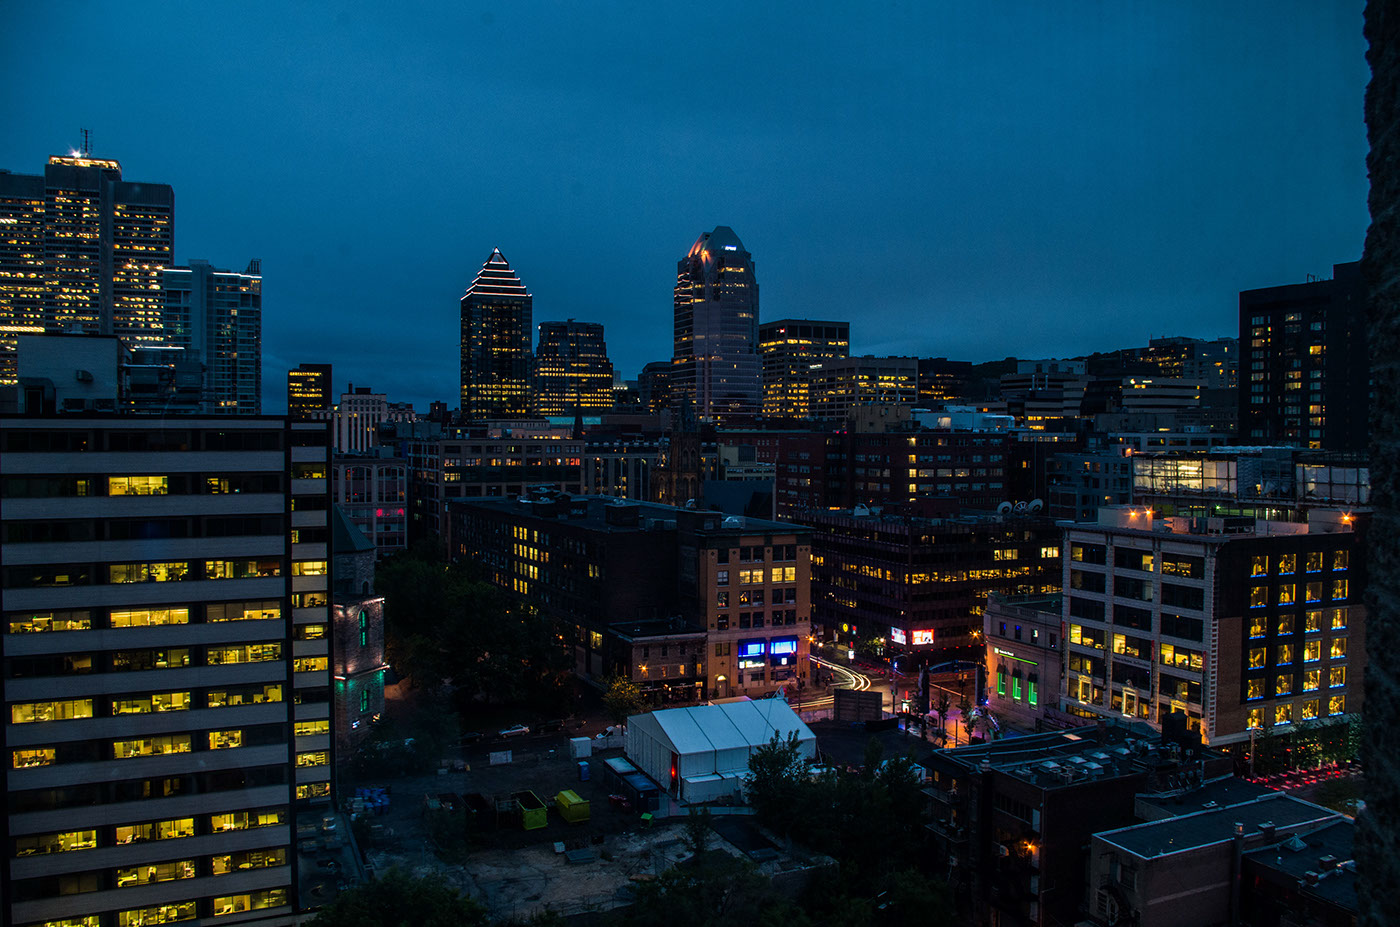 Nightfall in the city.